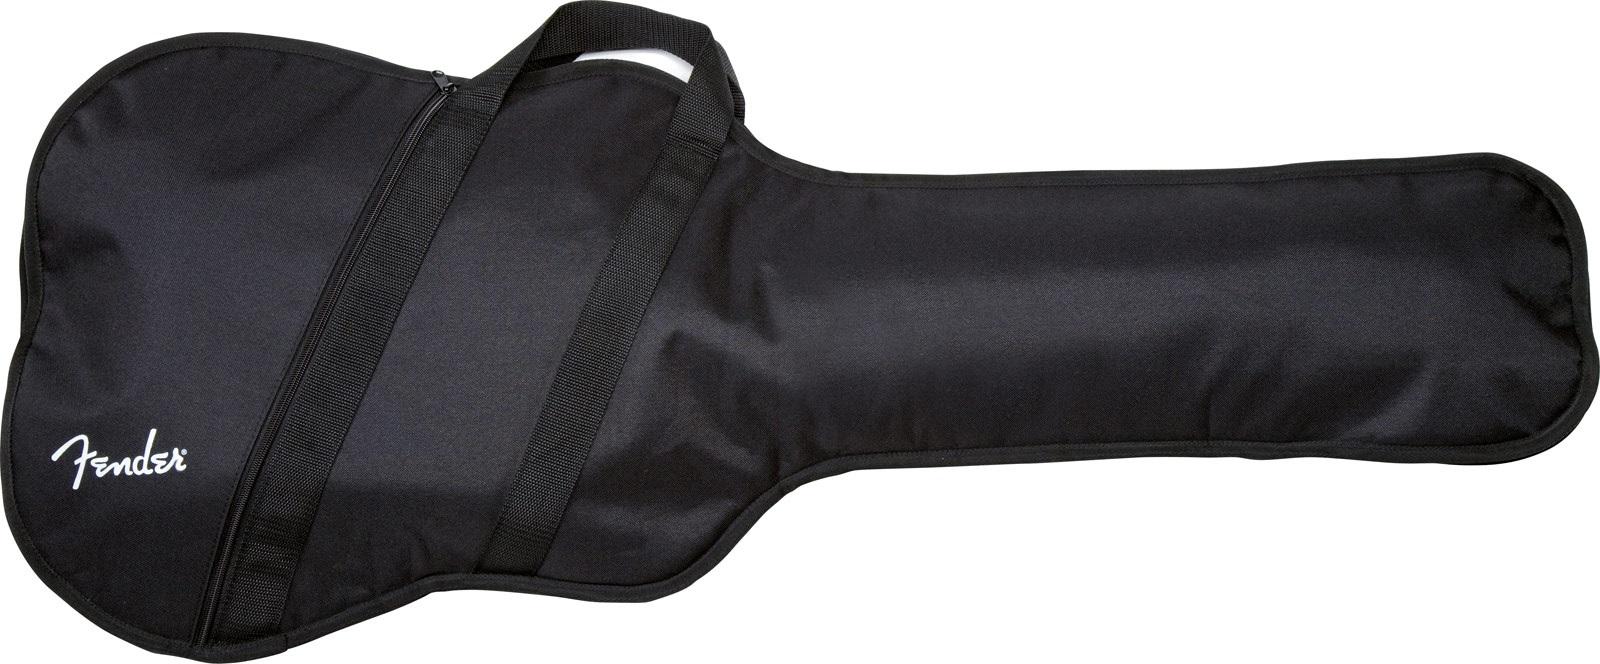 Fender Traditional Series, Stratocaster®/Telecaster® Gig Bag